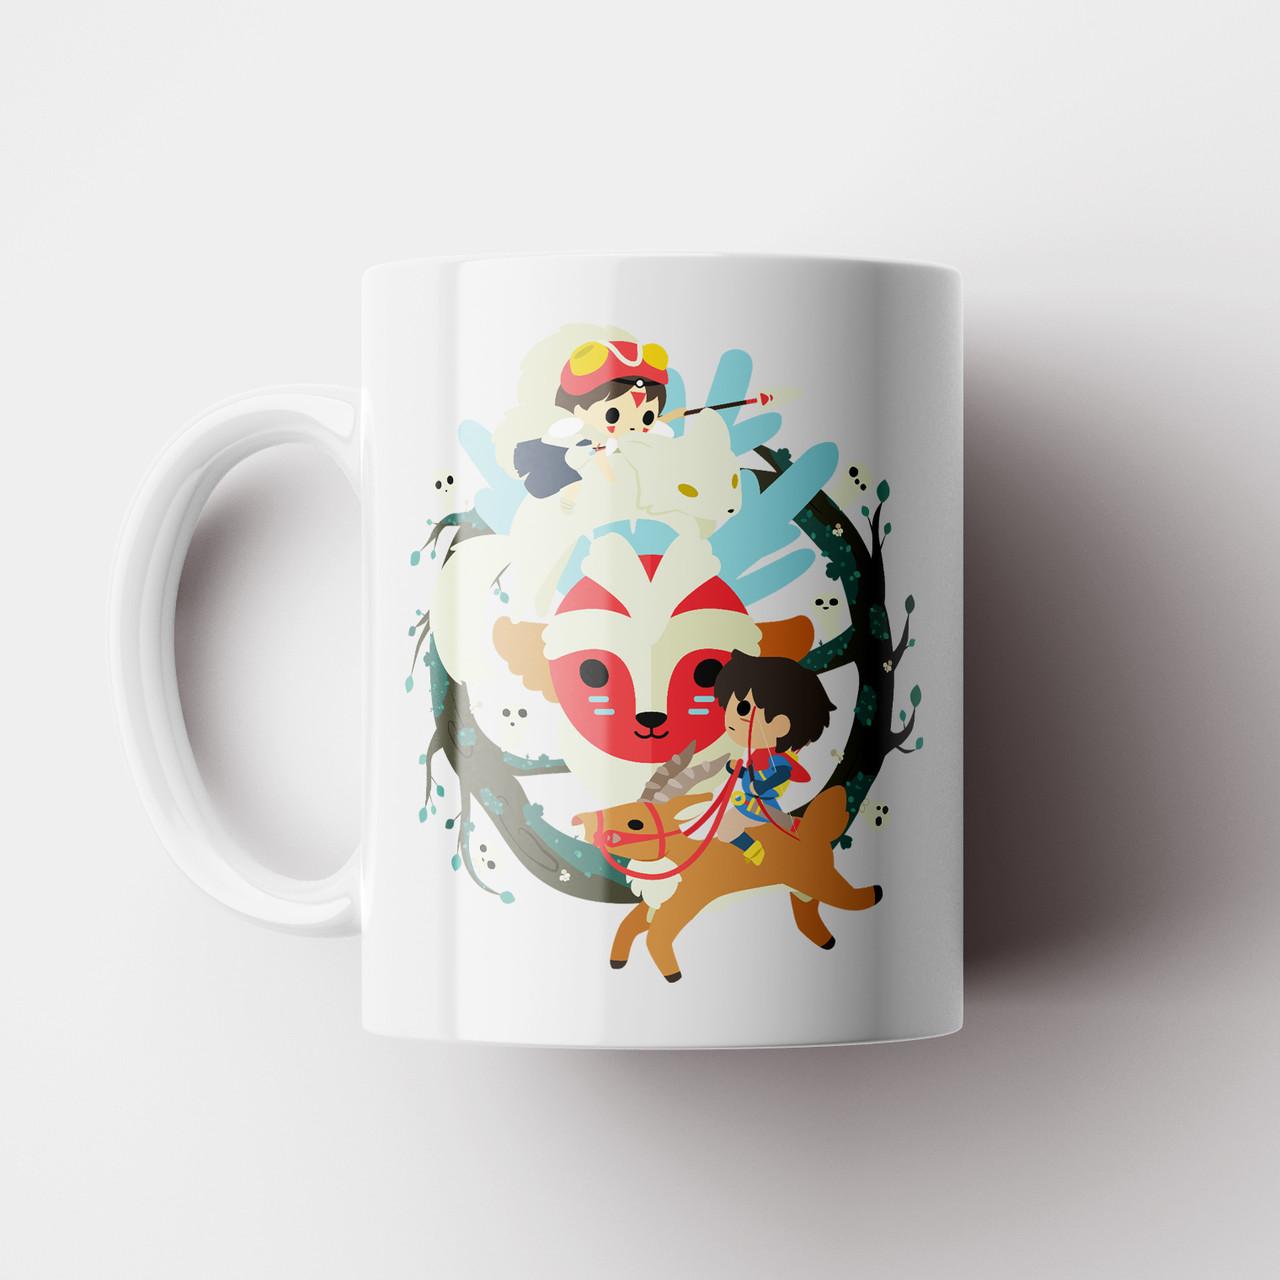 Кружка Принцесса Мононоке №7. Чашка Аниме